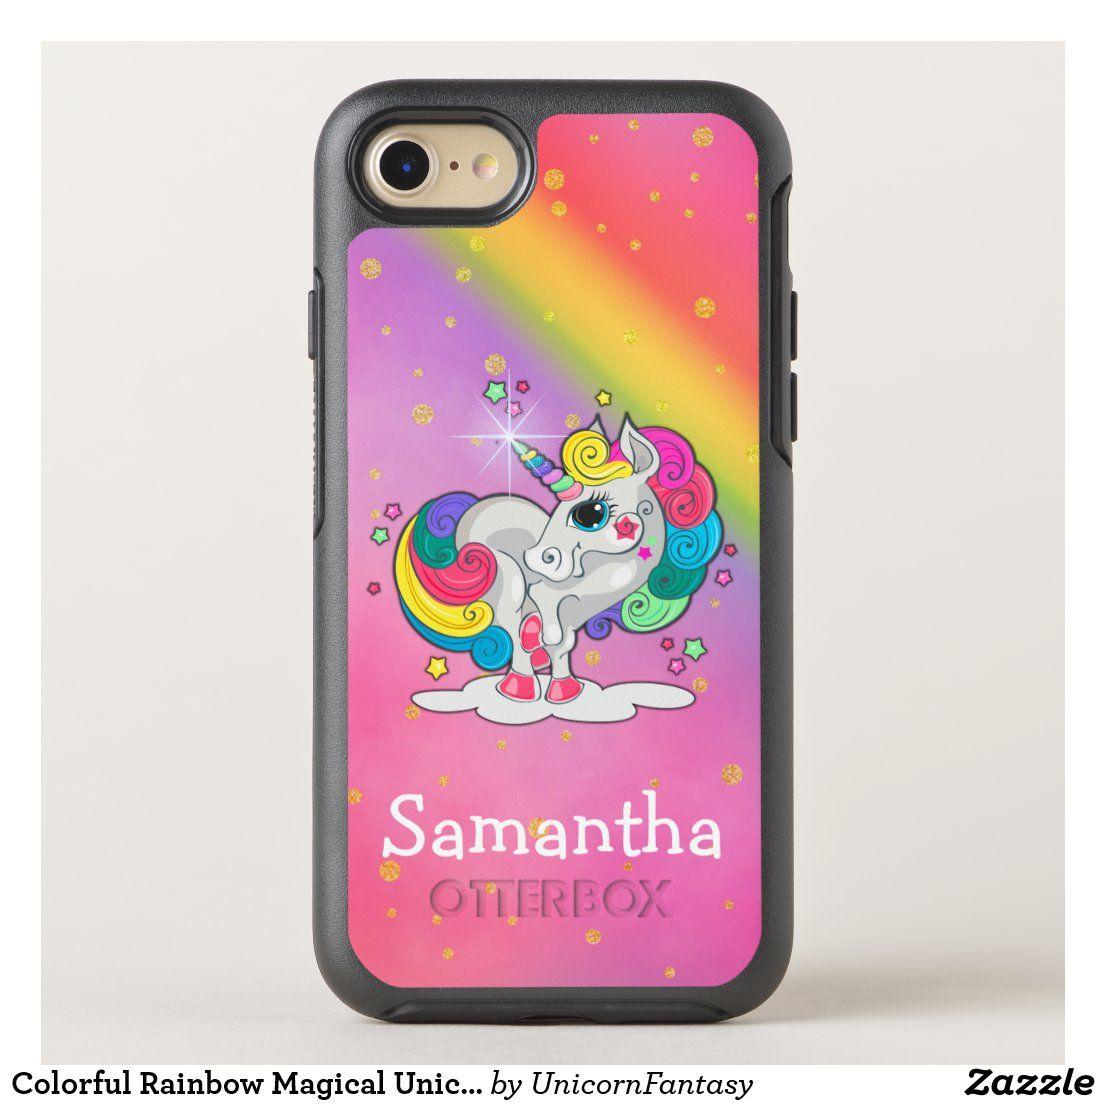 Colorful rainbow magical unicorn otterbox iphone case